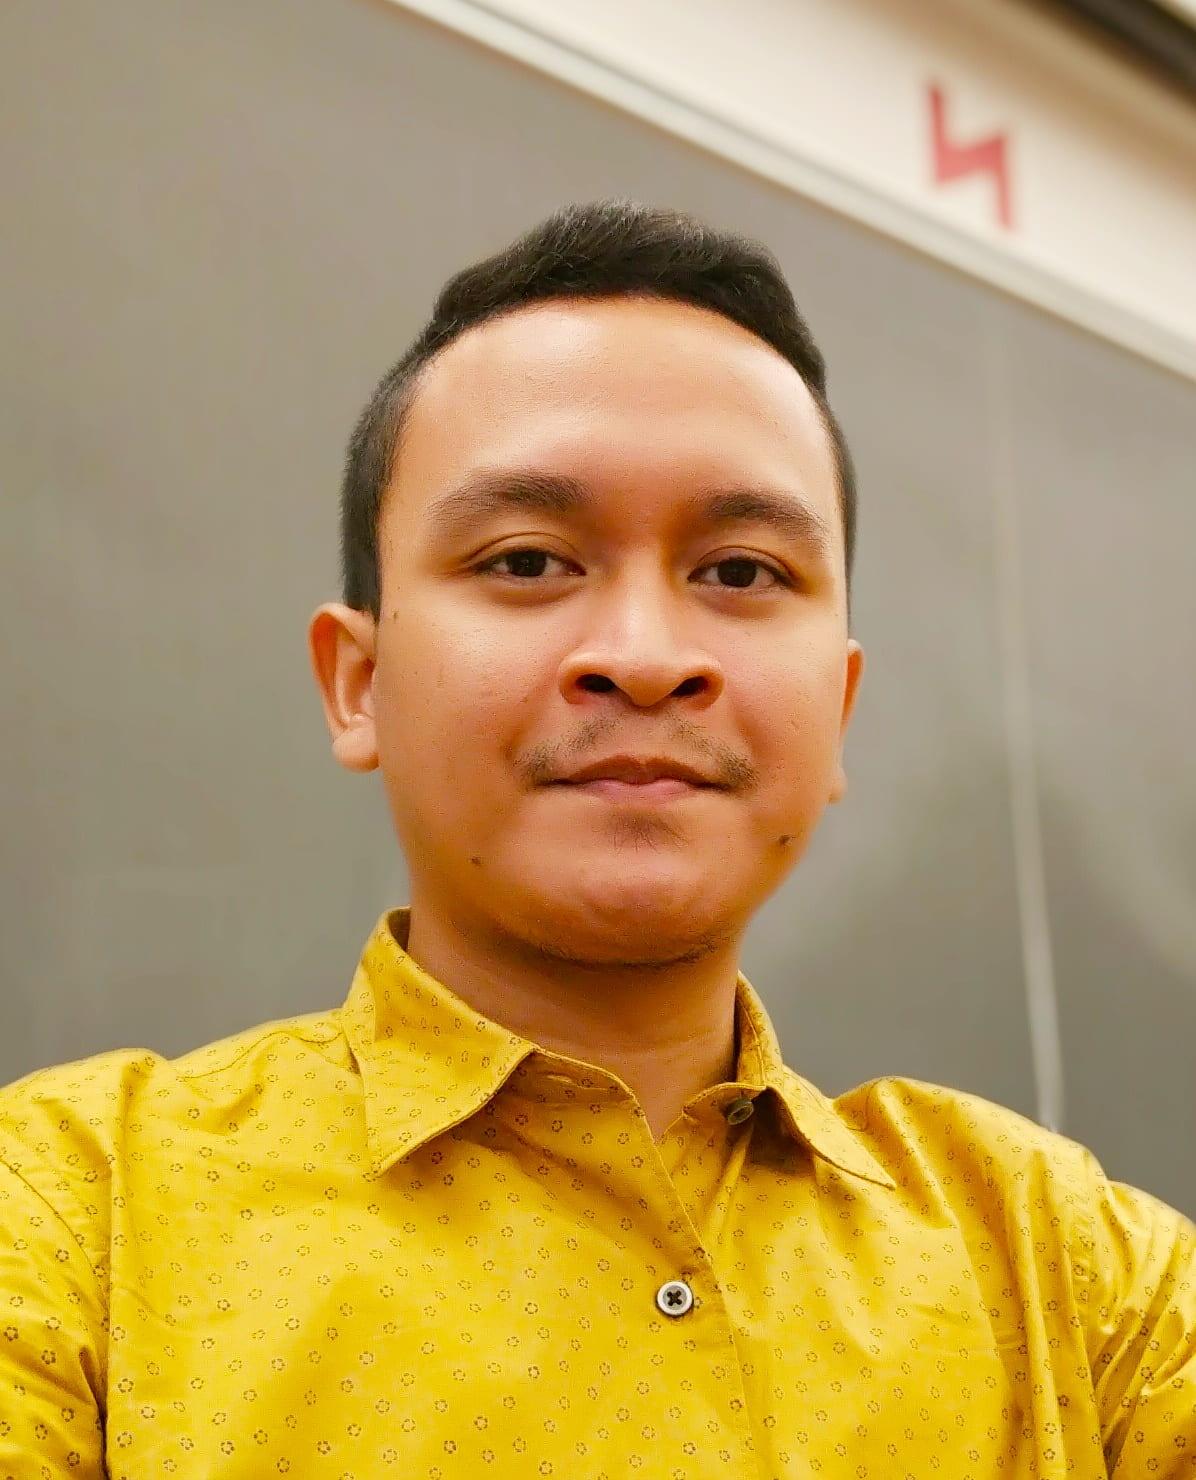 Hanifrahmawan Sudibyo